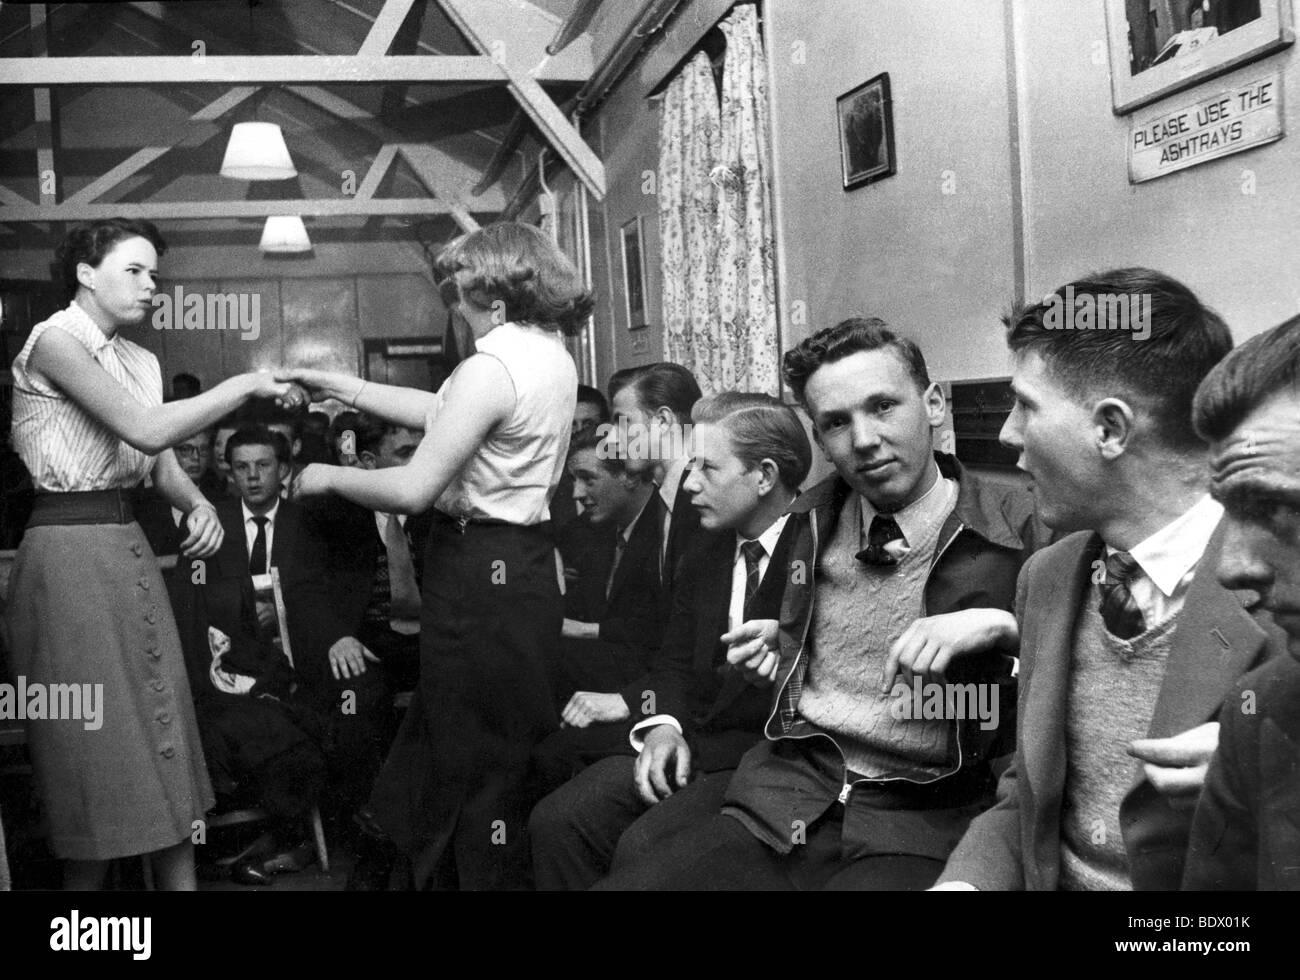 SOUTH LONDON teenage dance club nel 1957 Immagini Stock